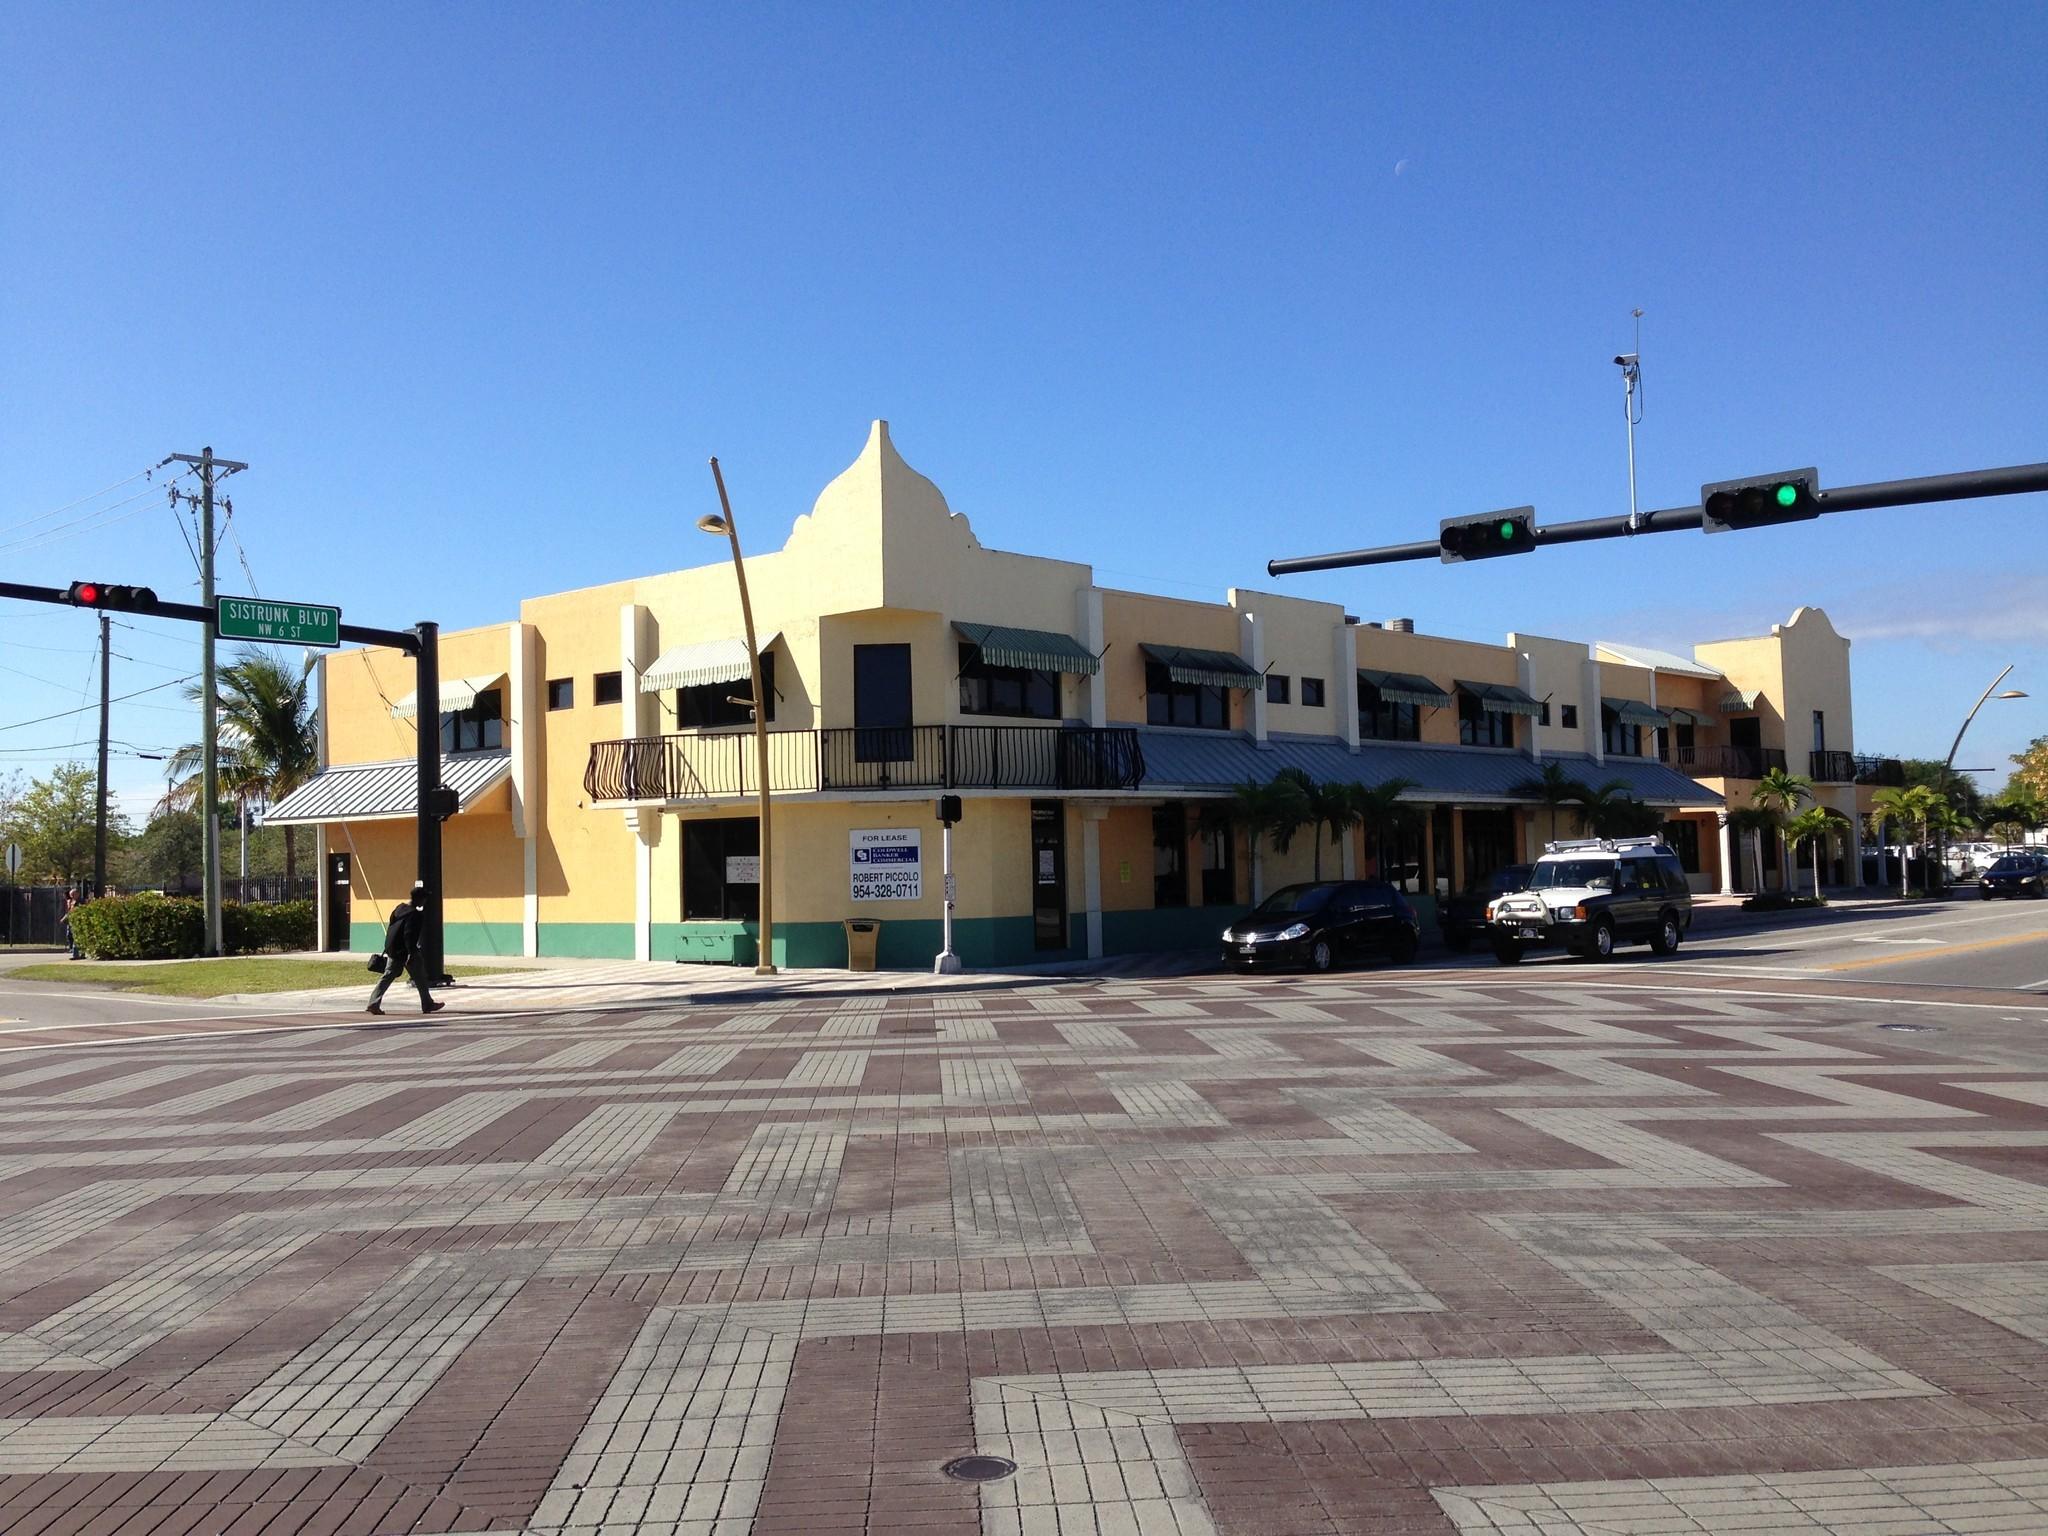 sistrunk plaza's failure threatens fort lauderdale's $1.2 million